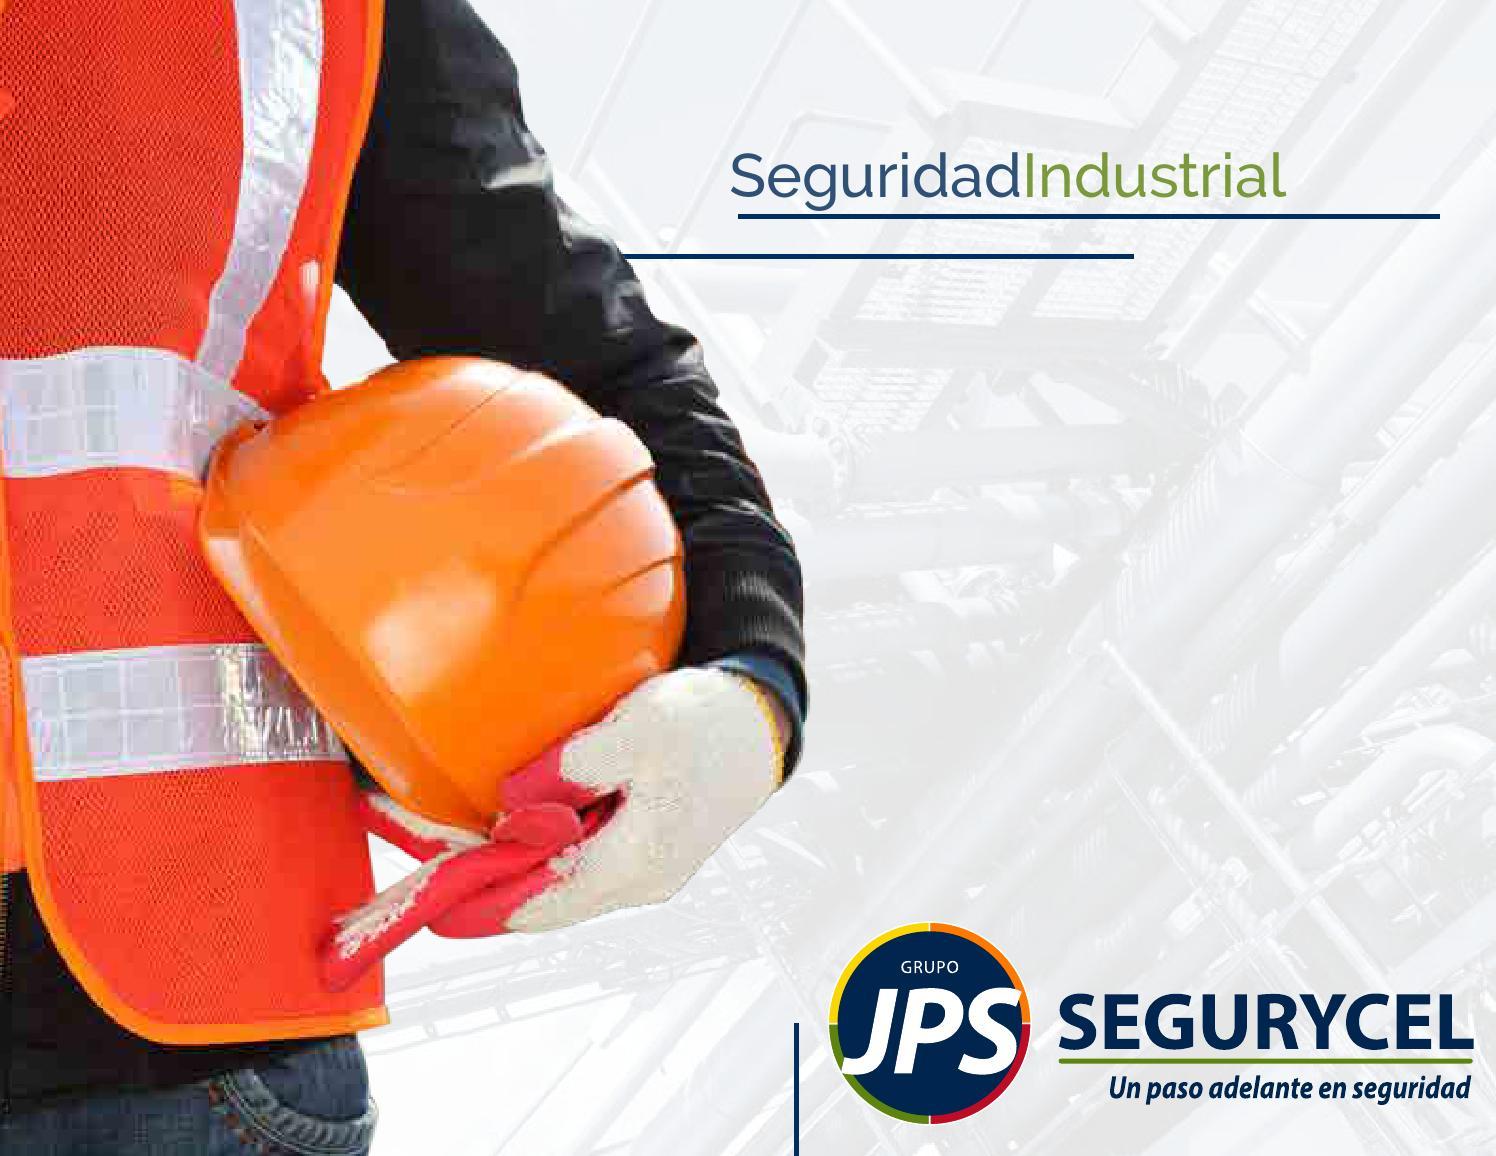 Catalogo JPS 2013 14 by Marketing Segurycel - issuu 793d46b690